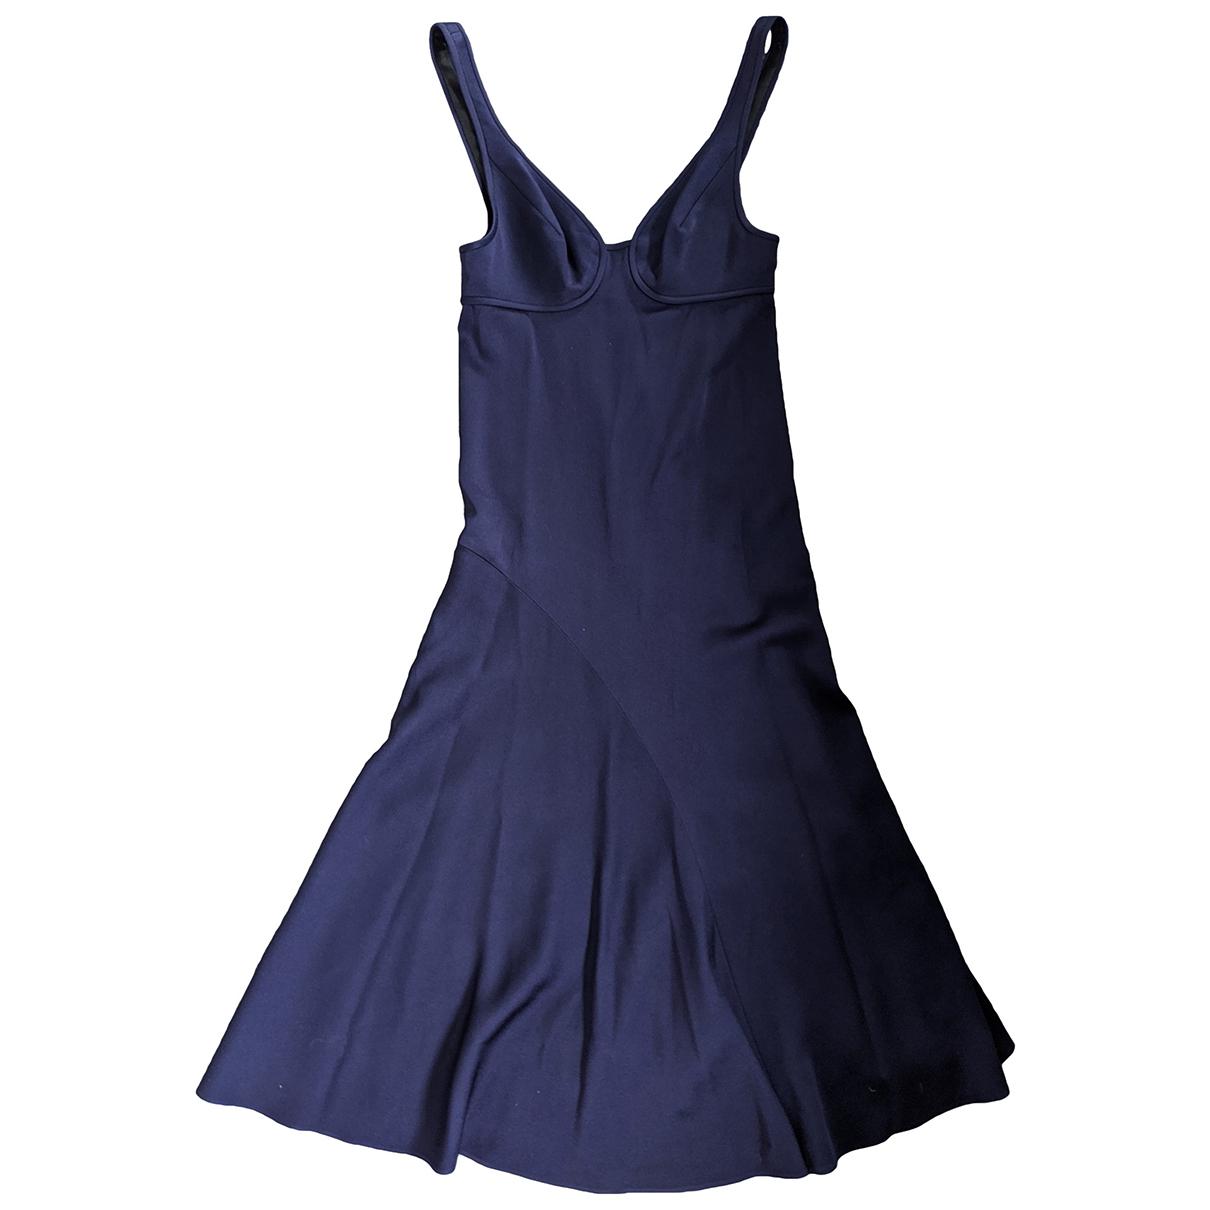 Victoria Beckham \N Blue dress for Women 8 UK